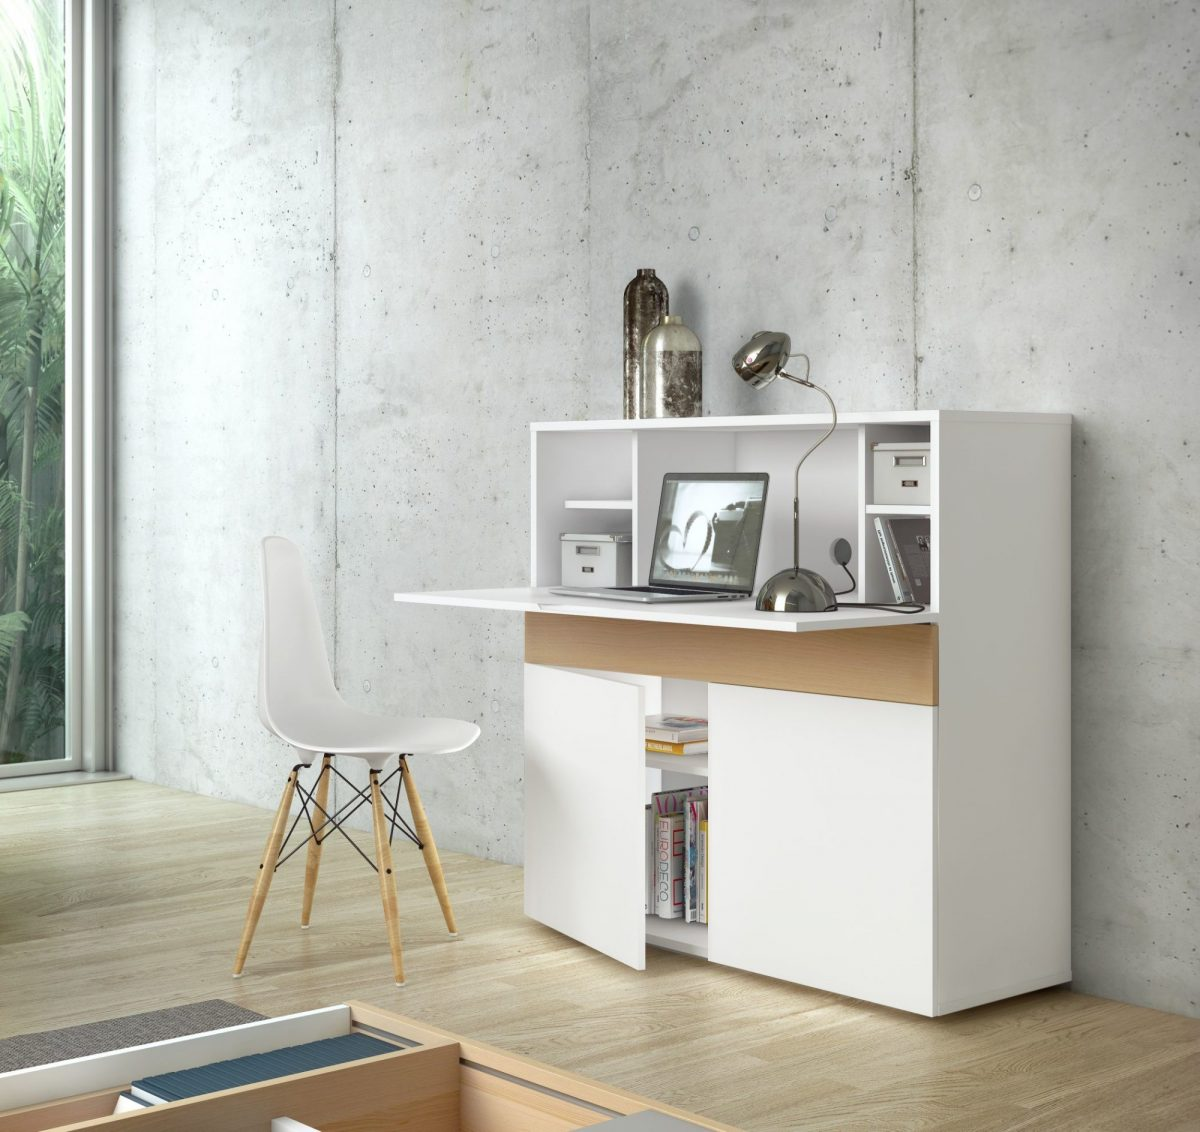 25bonami9500052606-focus-home-office-pure-white-oak-11_16384205810_o-1200x1200.jpg